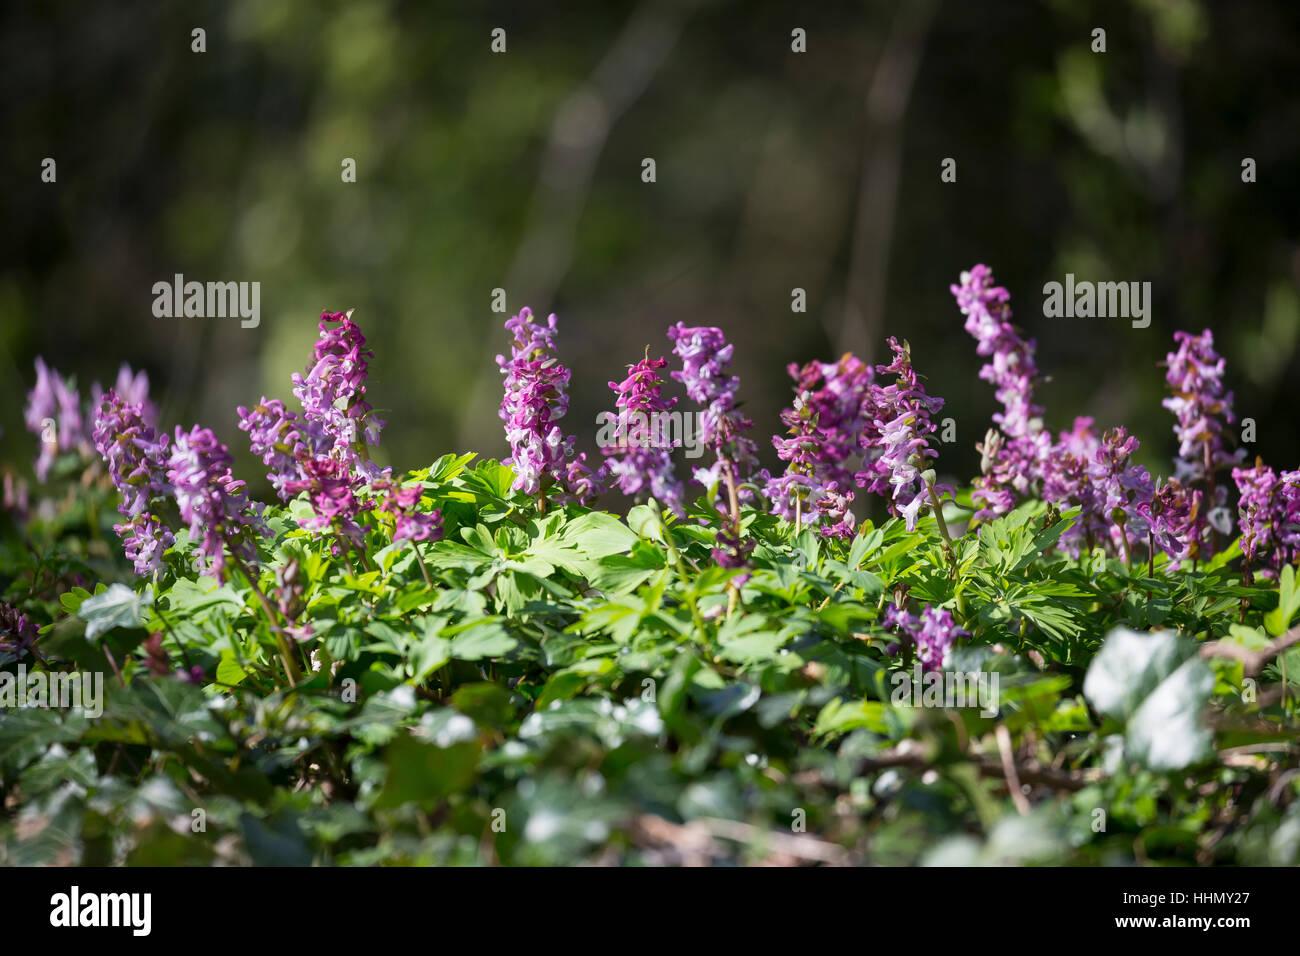 Hohler Lerchensporn, Hohlknolliger Lerchensporn, Corydalis cava, Corydalis bulbosa, Bulbous Corydalis, Hollowroot, - Stock Image